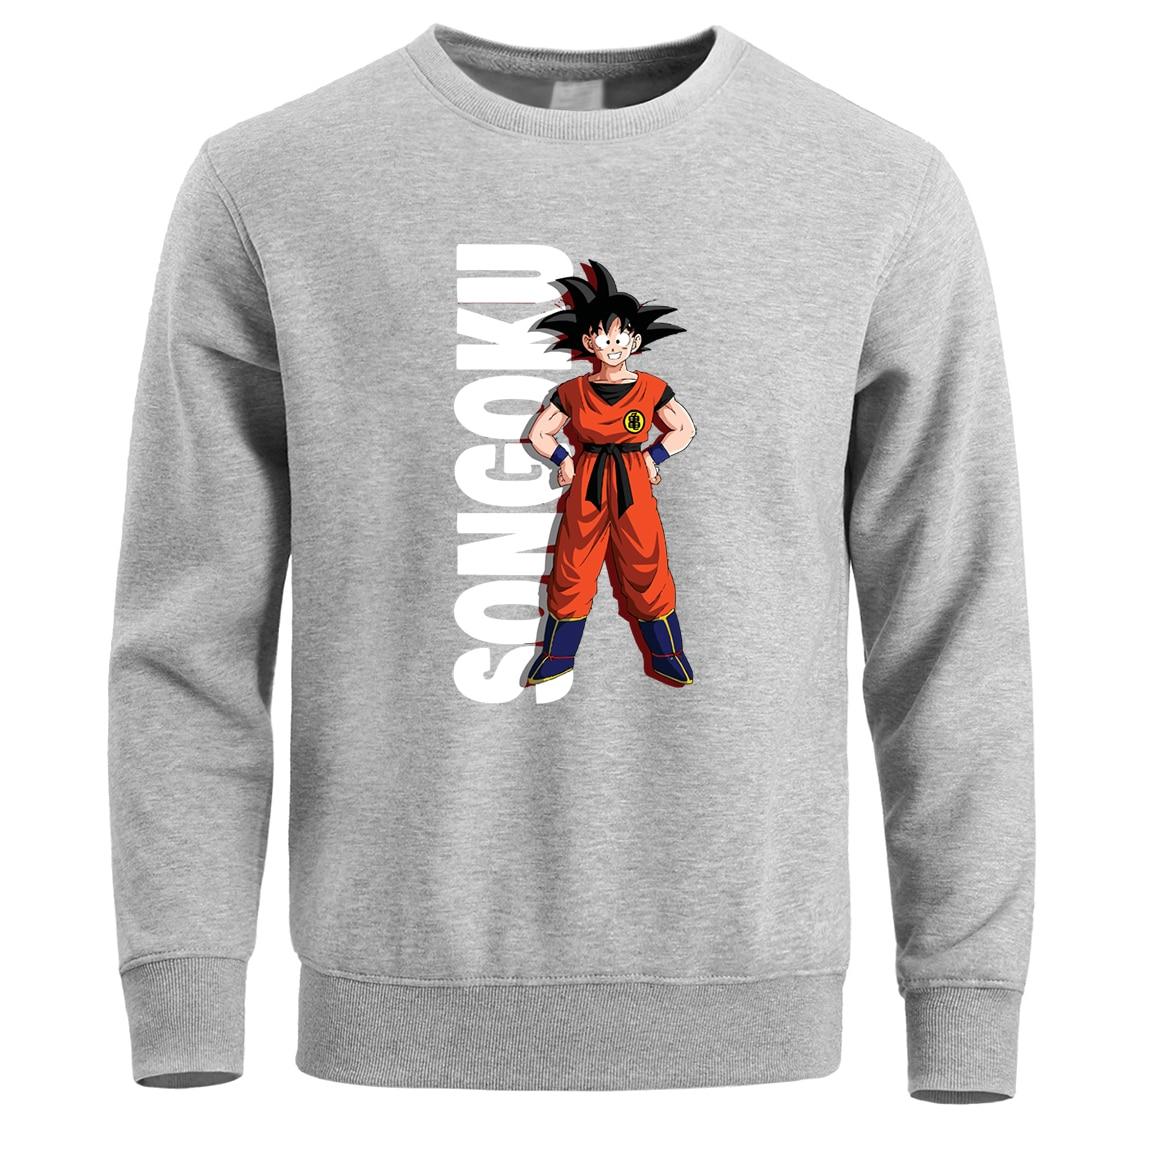 Dragon Ball Z Super Sai Yan Men Hoodies Sweatshirts Crewneck Hoodie Sweatshirt Pullover Winter Fleece Warm Anime Black Hoody